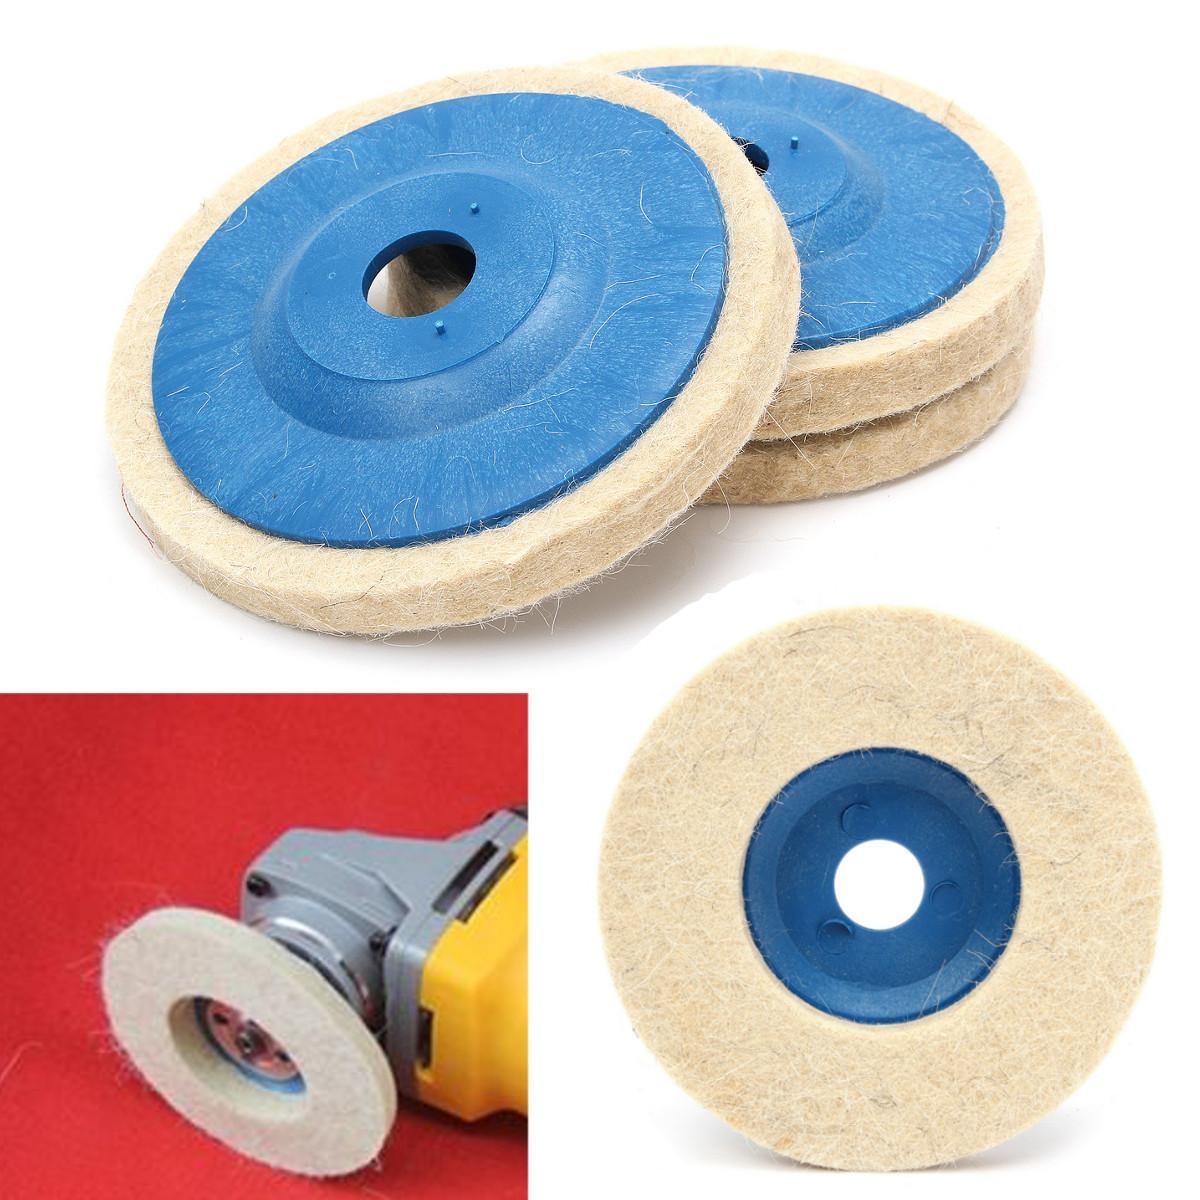 3Pcs Set 100mm Wool Buffing Angle Grinder Wheel Felt Polishing Disc Pad Tool For Sander Polishing Disc Buffing Car Polisher